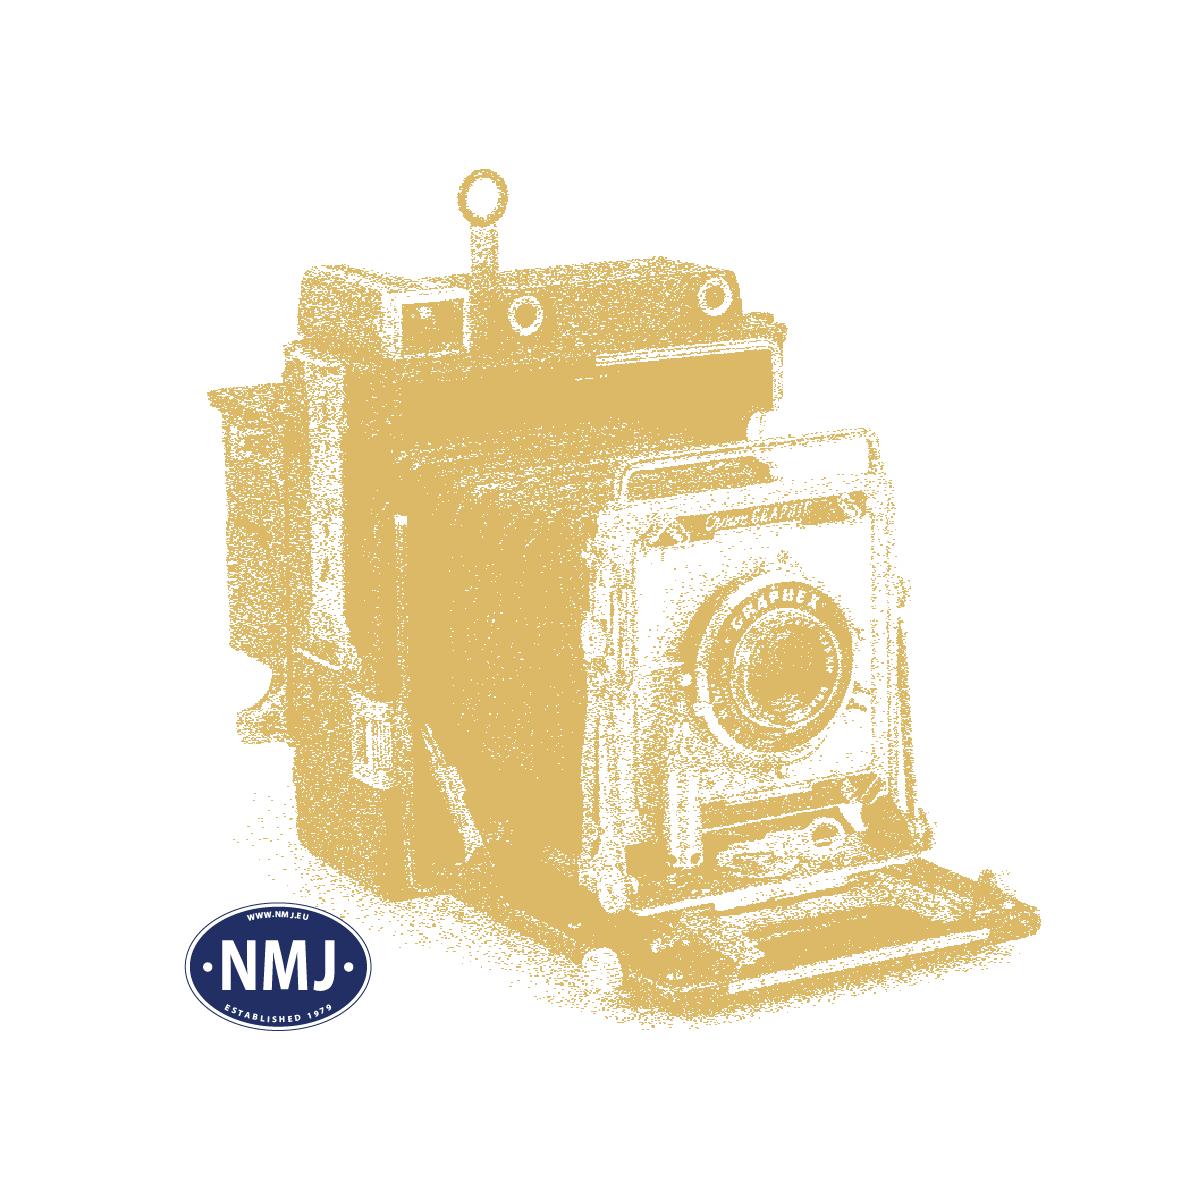 GMKAL19 - Nohab GM Kalender 2019, A3 Format